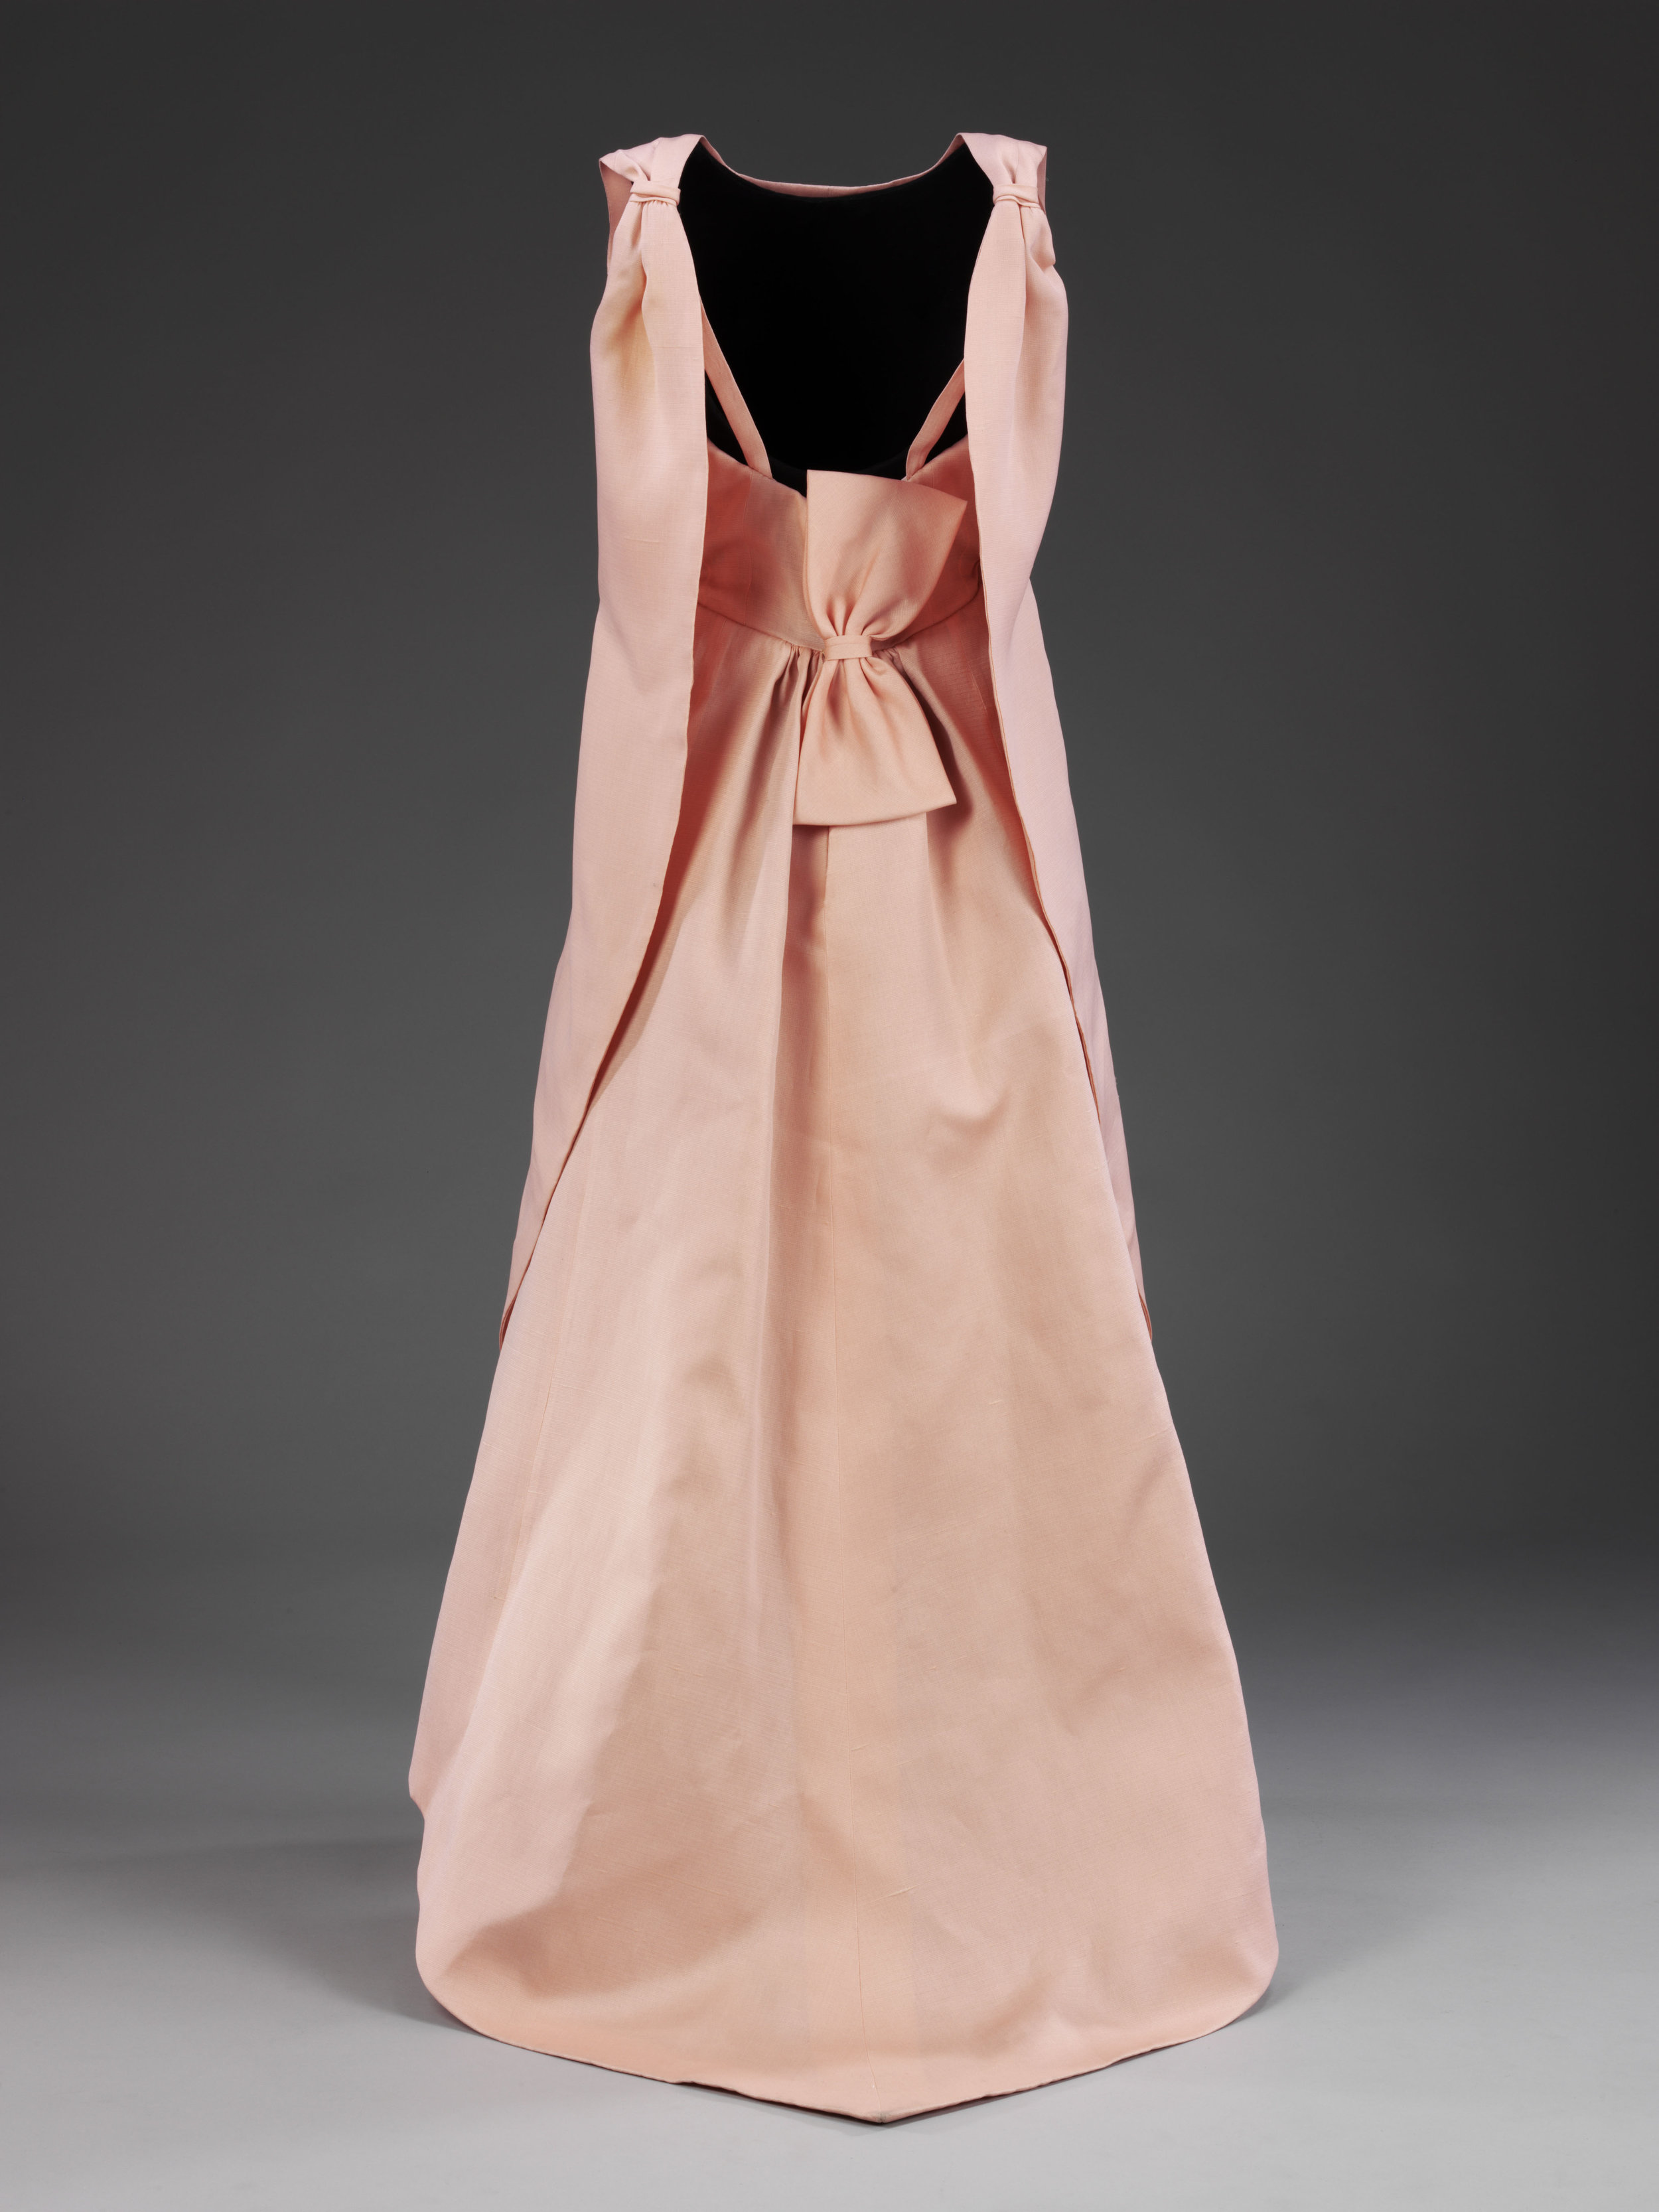 La Tulipe Evening Dress,Balenciaga for EISA,Spain,1965,© Victoria and Albert Museum, London.